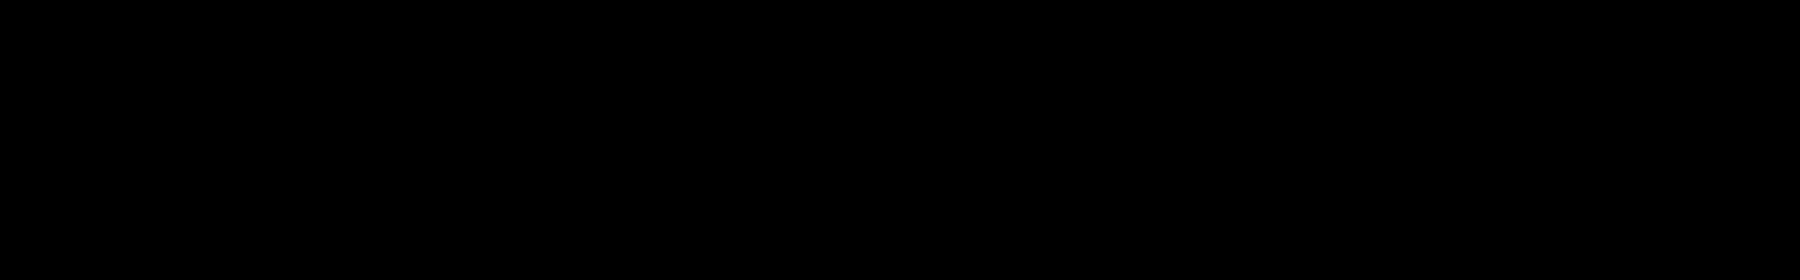 Pole Techno audio waveform